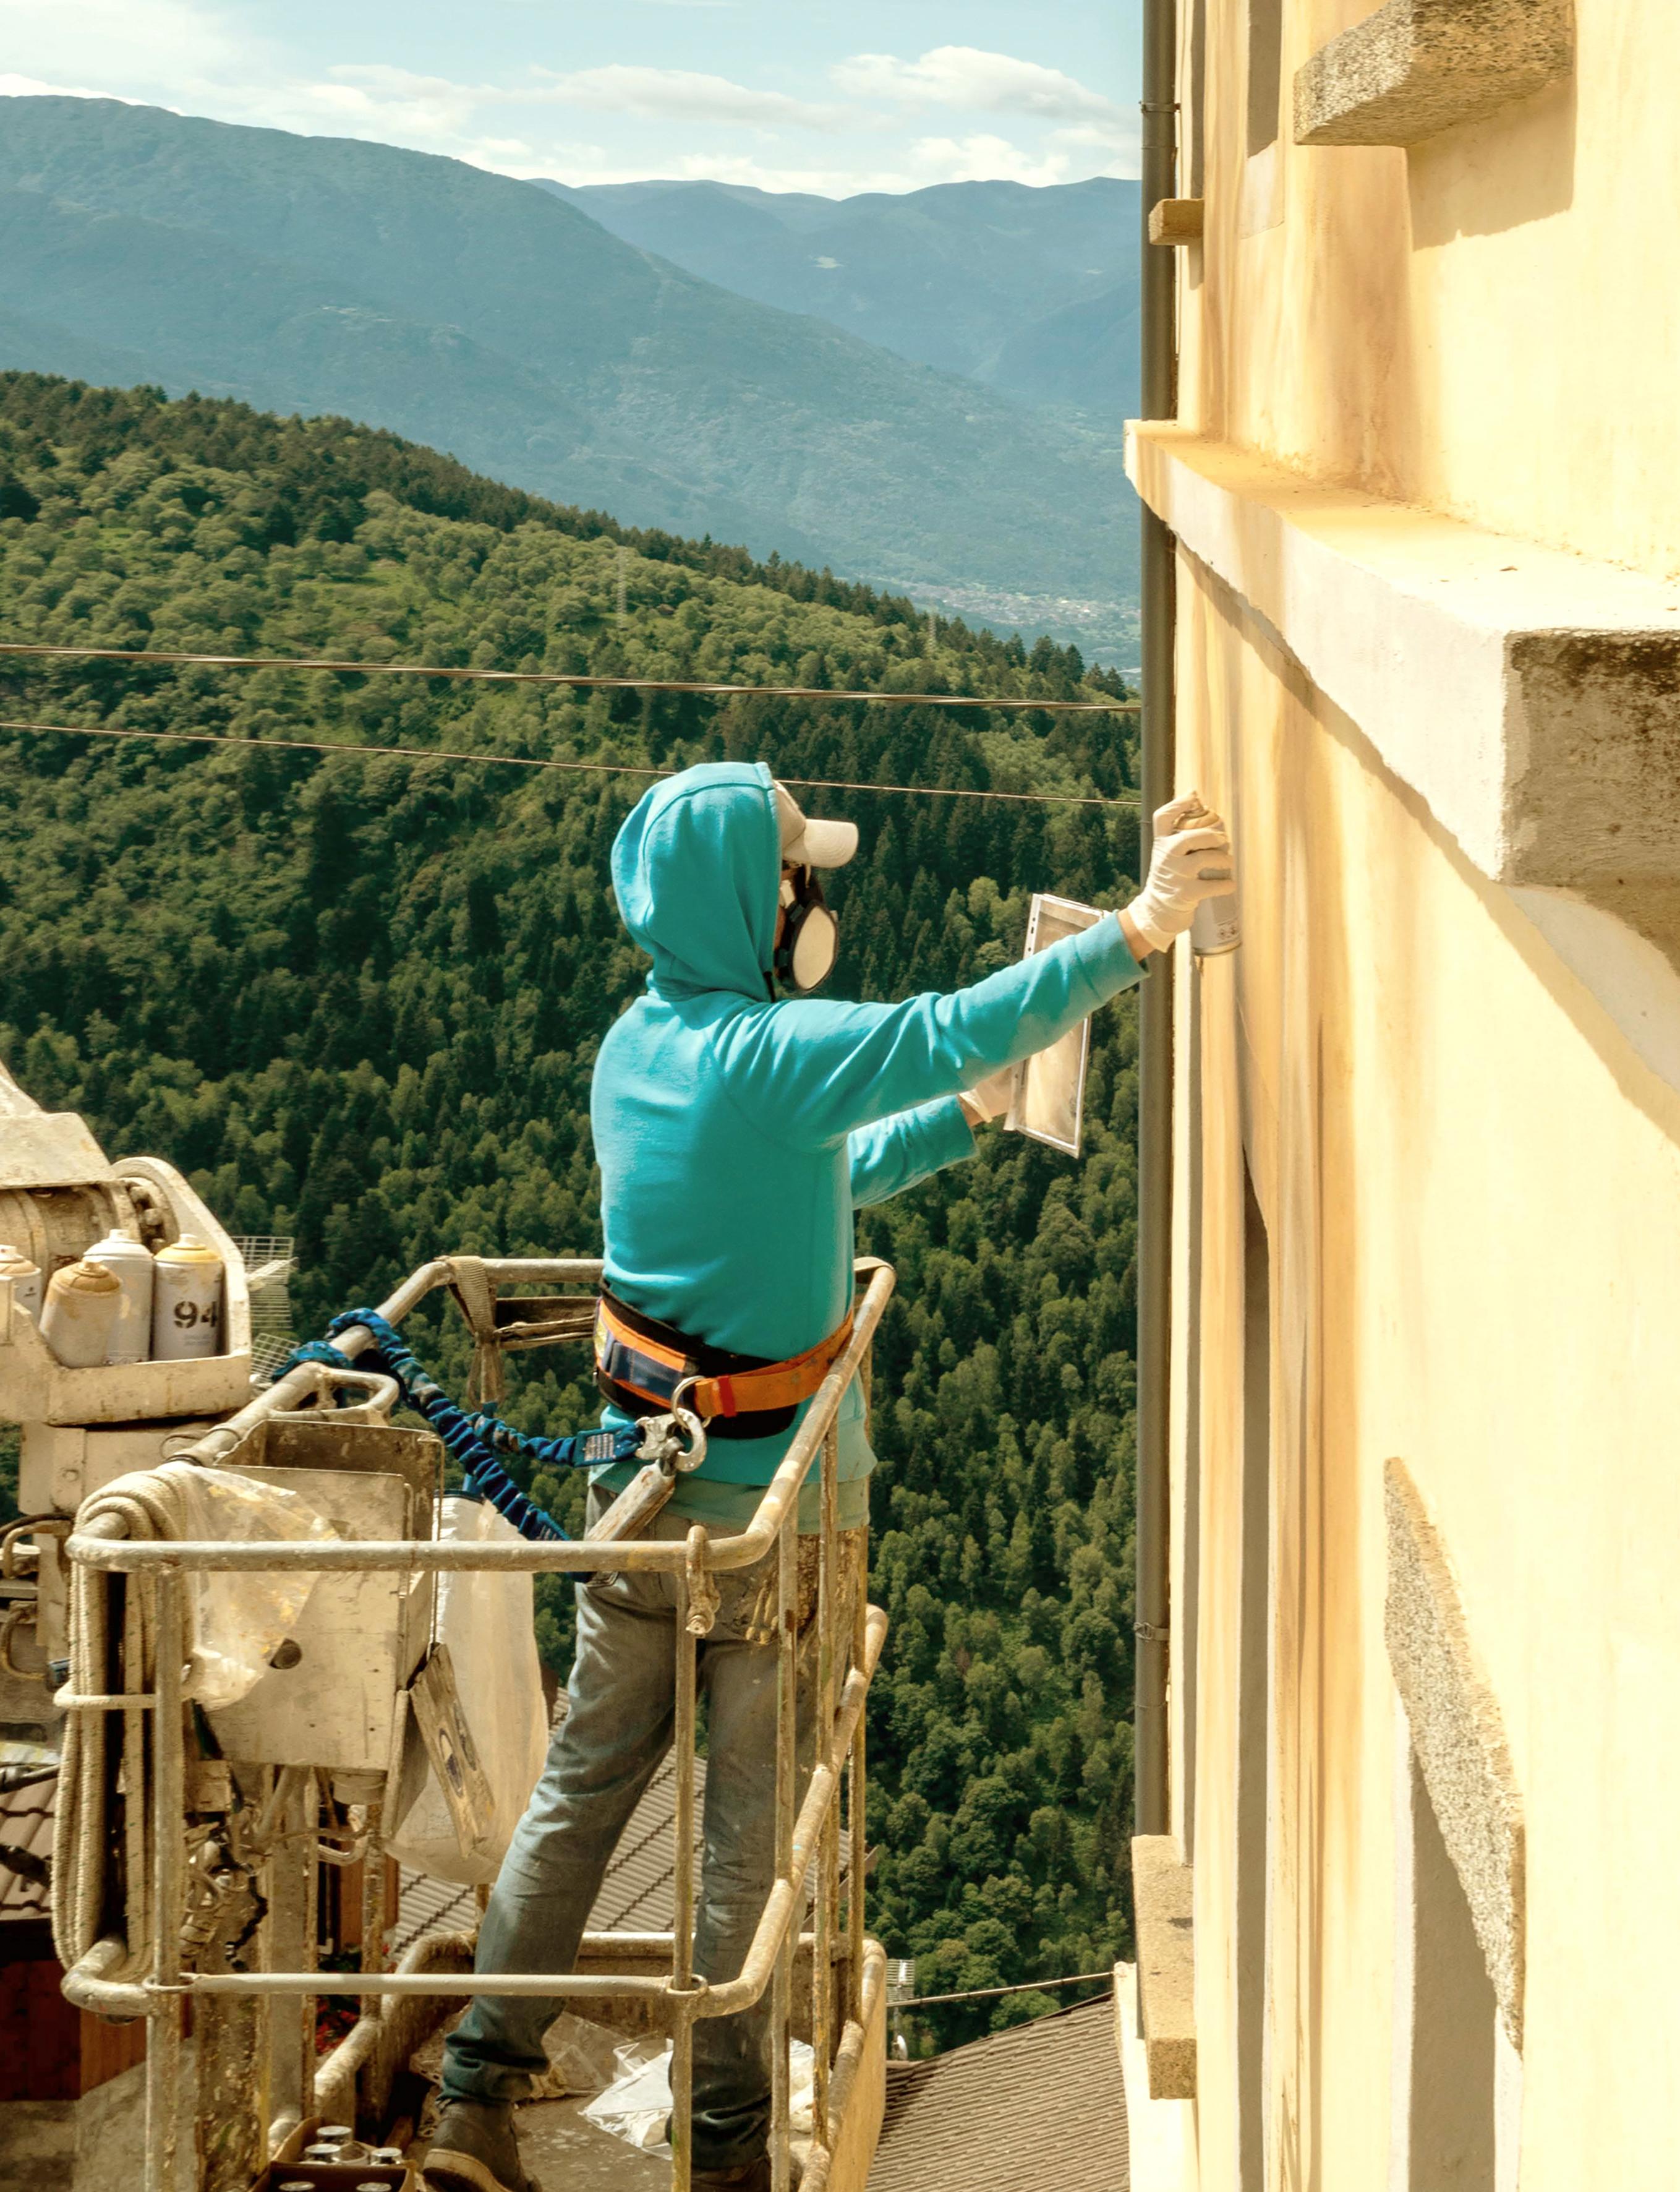 eron cevo soul of the wall wall in art distretto culturale valle camonica